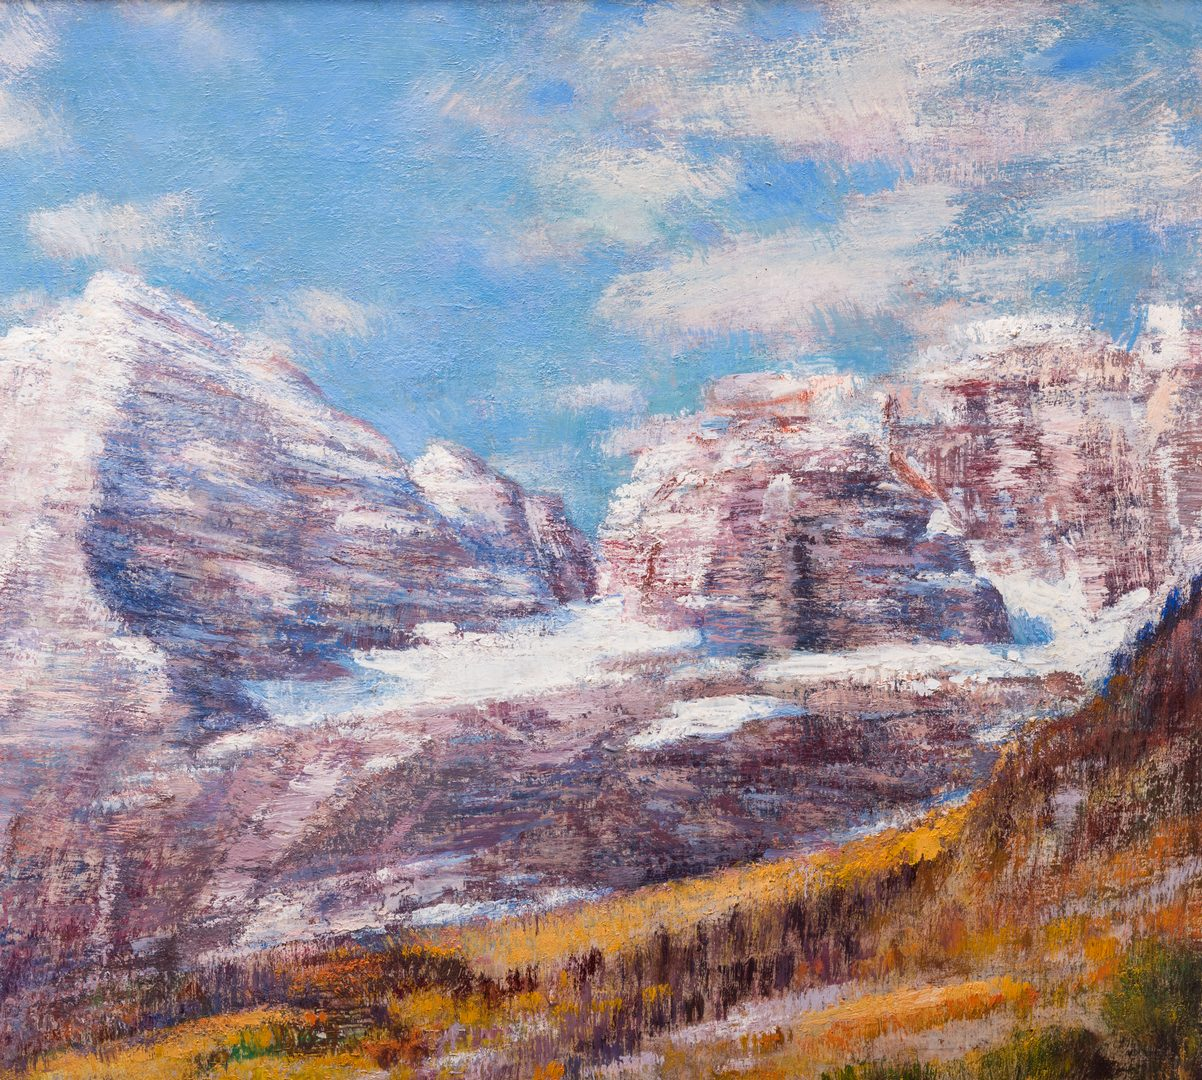 Lot 406: Gaspere Ruffolo O/B, Colorado Landscape